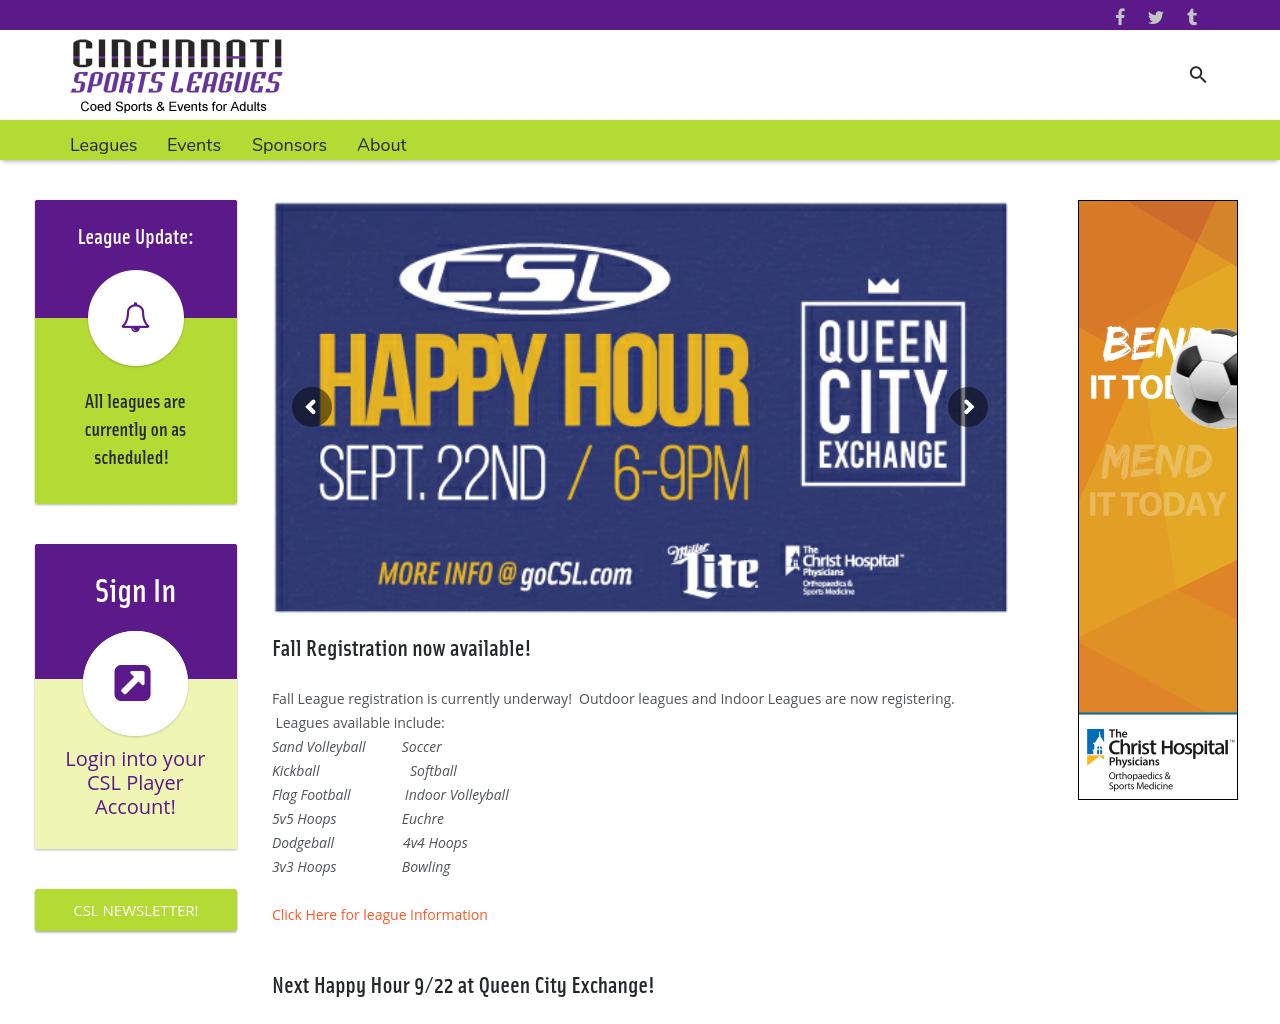 Cincinnati-Sports-Leagues-Advertising-Reviews-Pricing